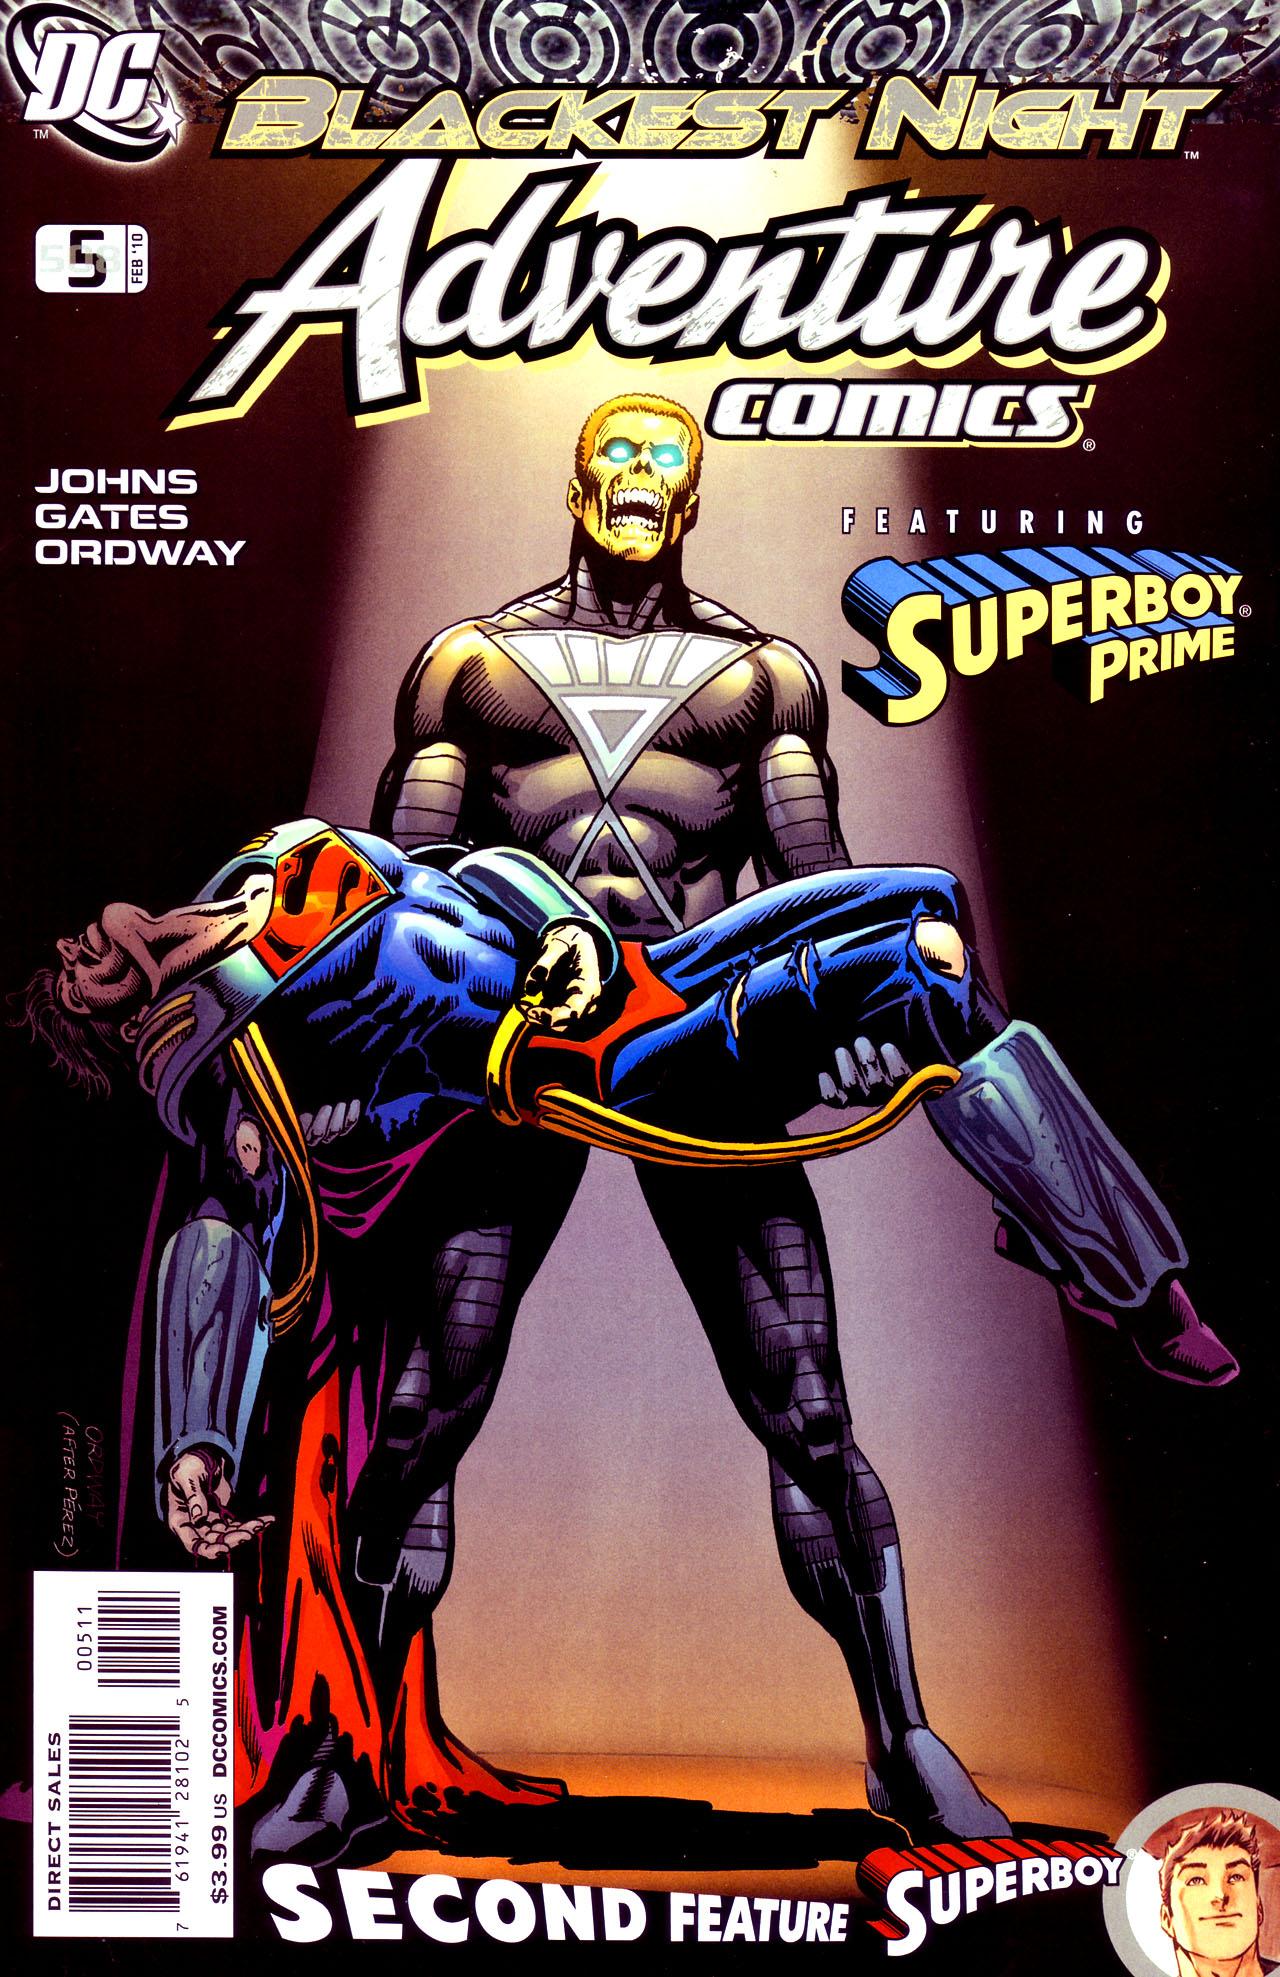 Adventure Comics (2009) 5 Page 1